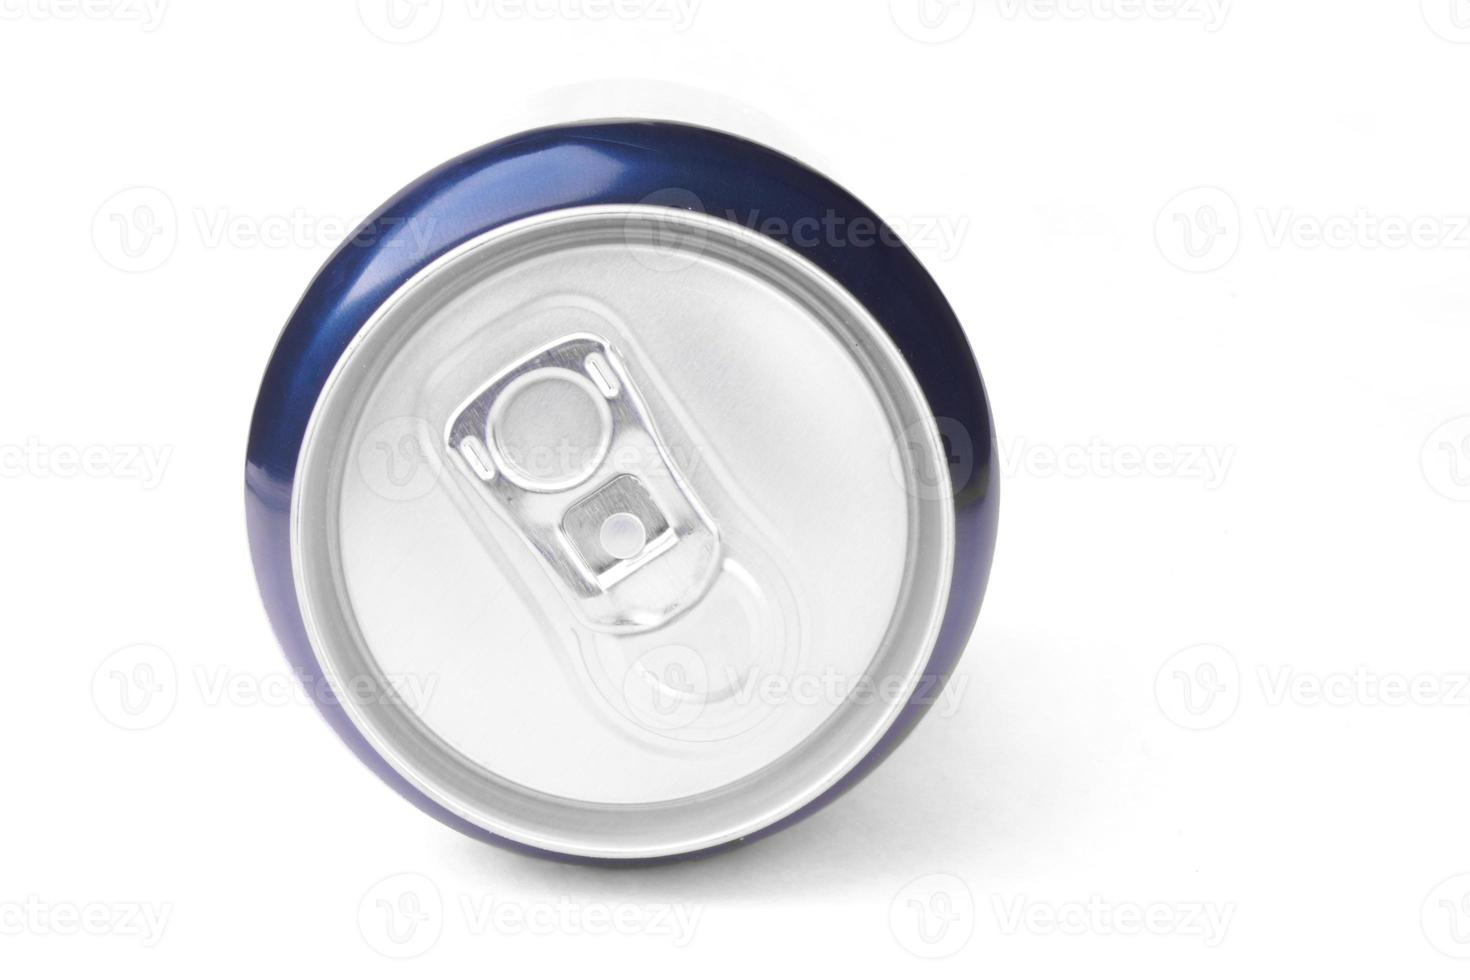 bebida enlatada foto